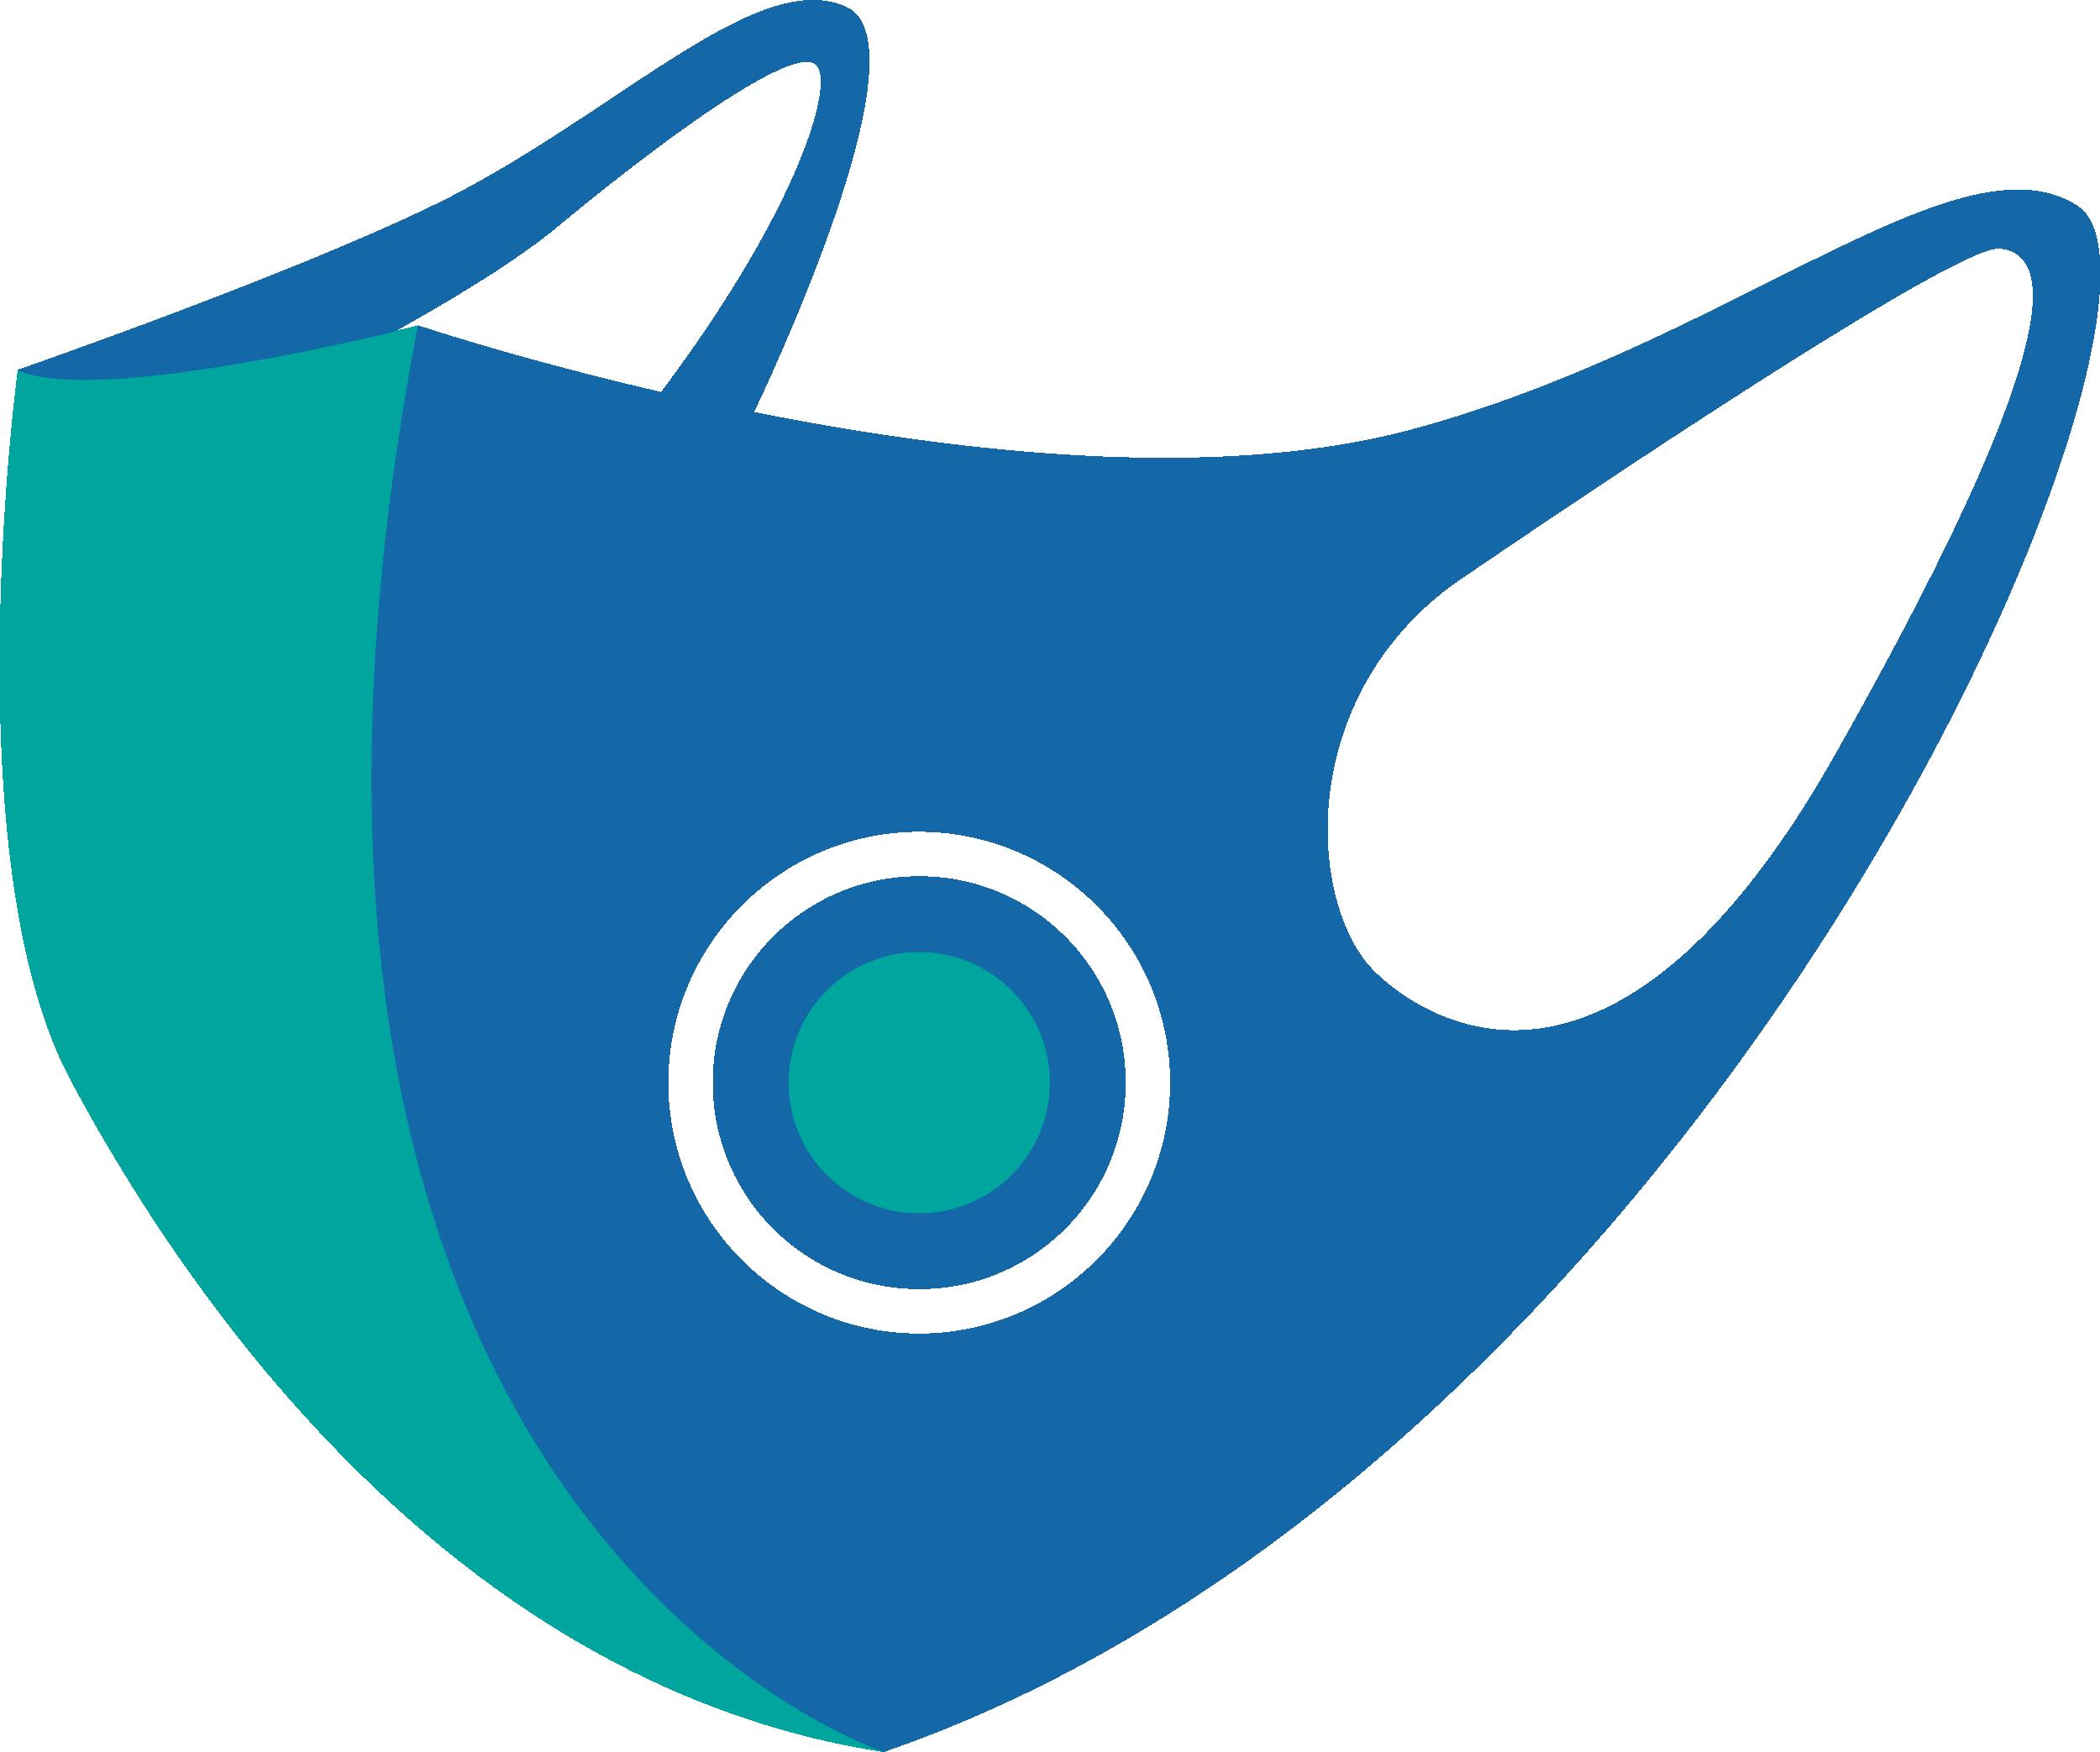 Face Mask Coronavirus Disease covid-19 Free DXF File